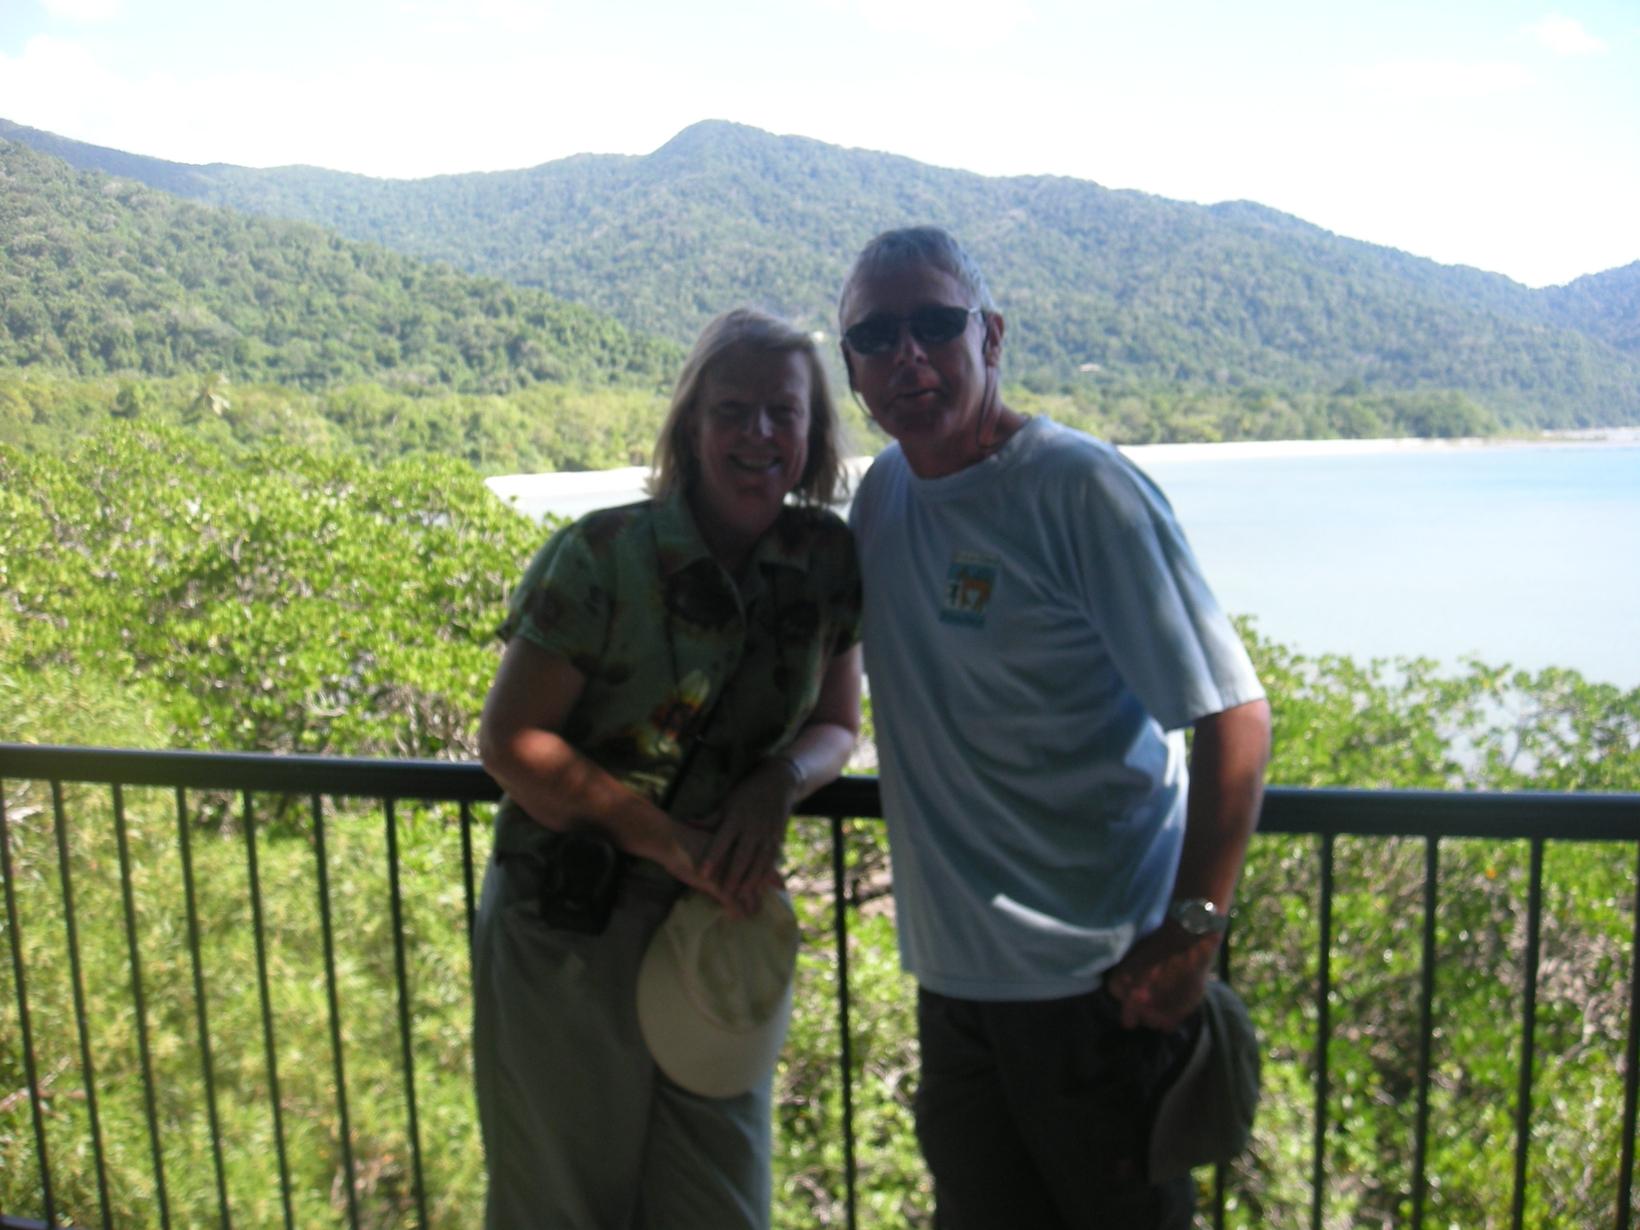 Bob & Susan from Plymouth, United Kingdom